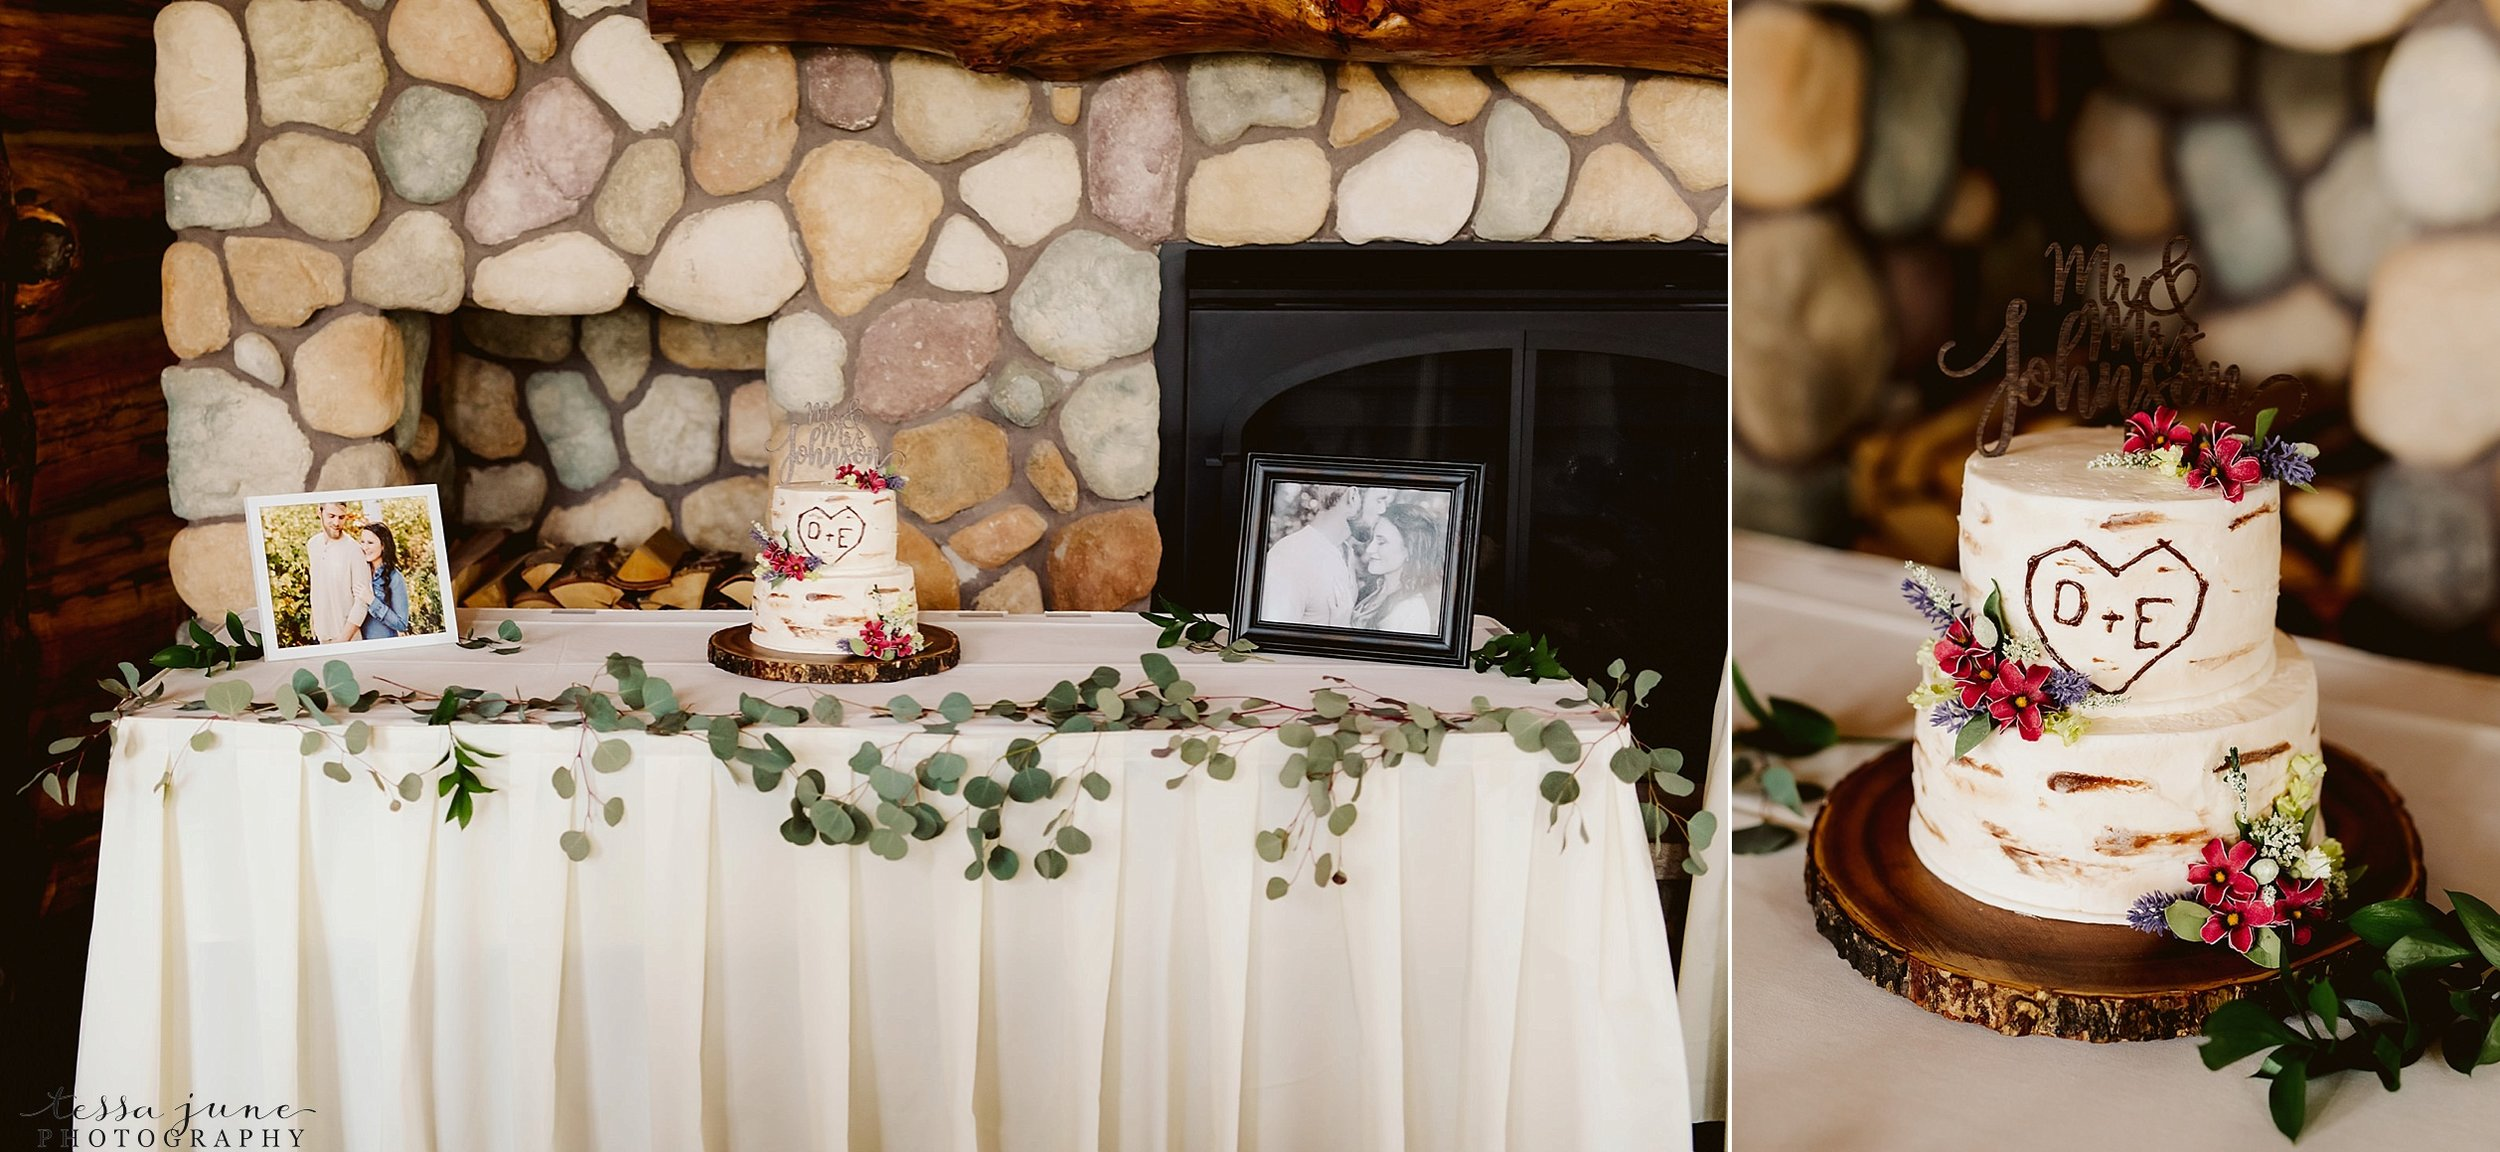 The-grands-at-mulligans-wedding-sartell-minnesota-spring-floral-spring-garden-wedding-17.jpg